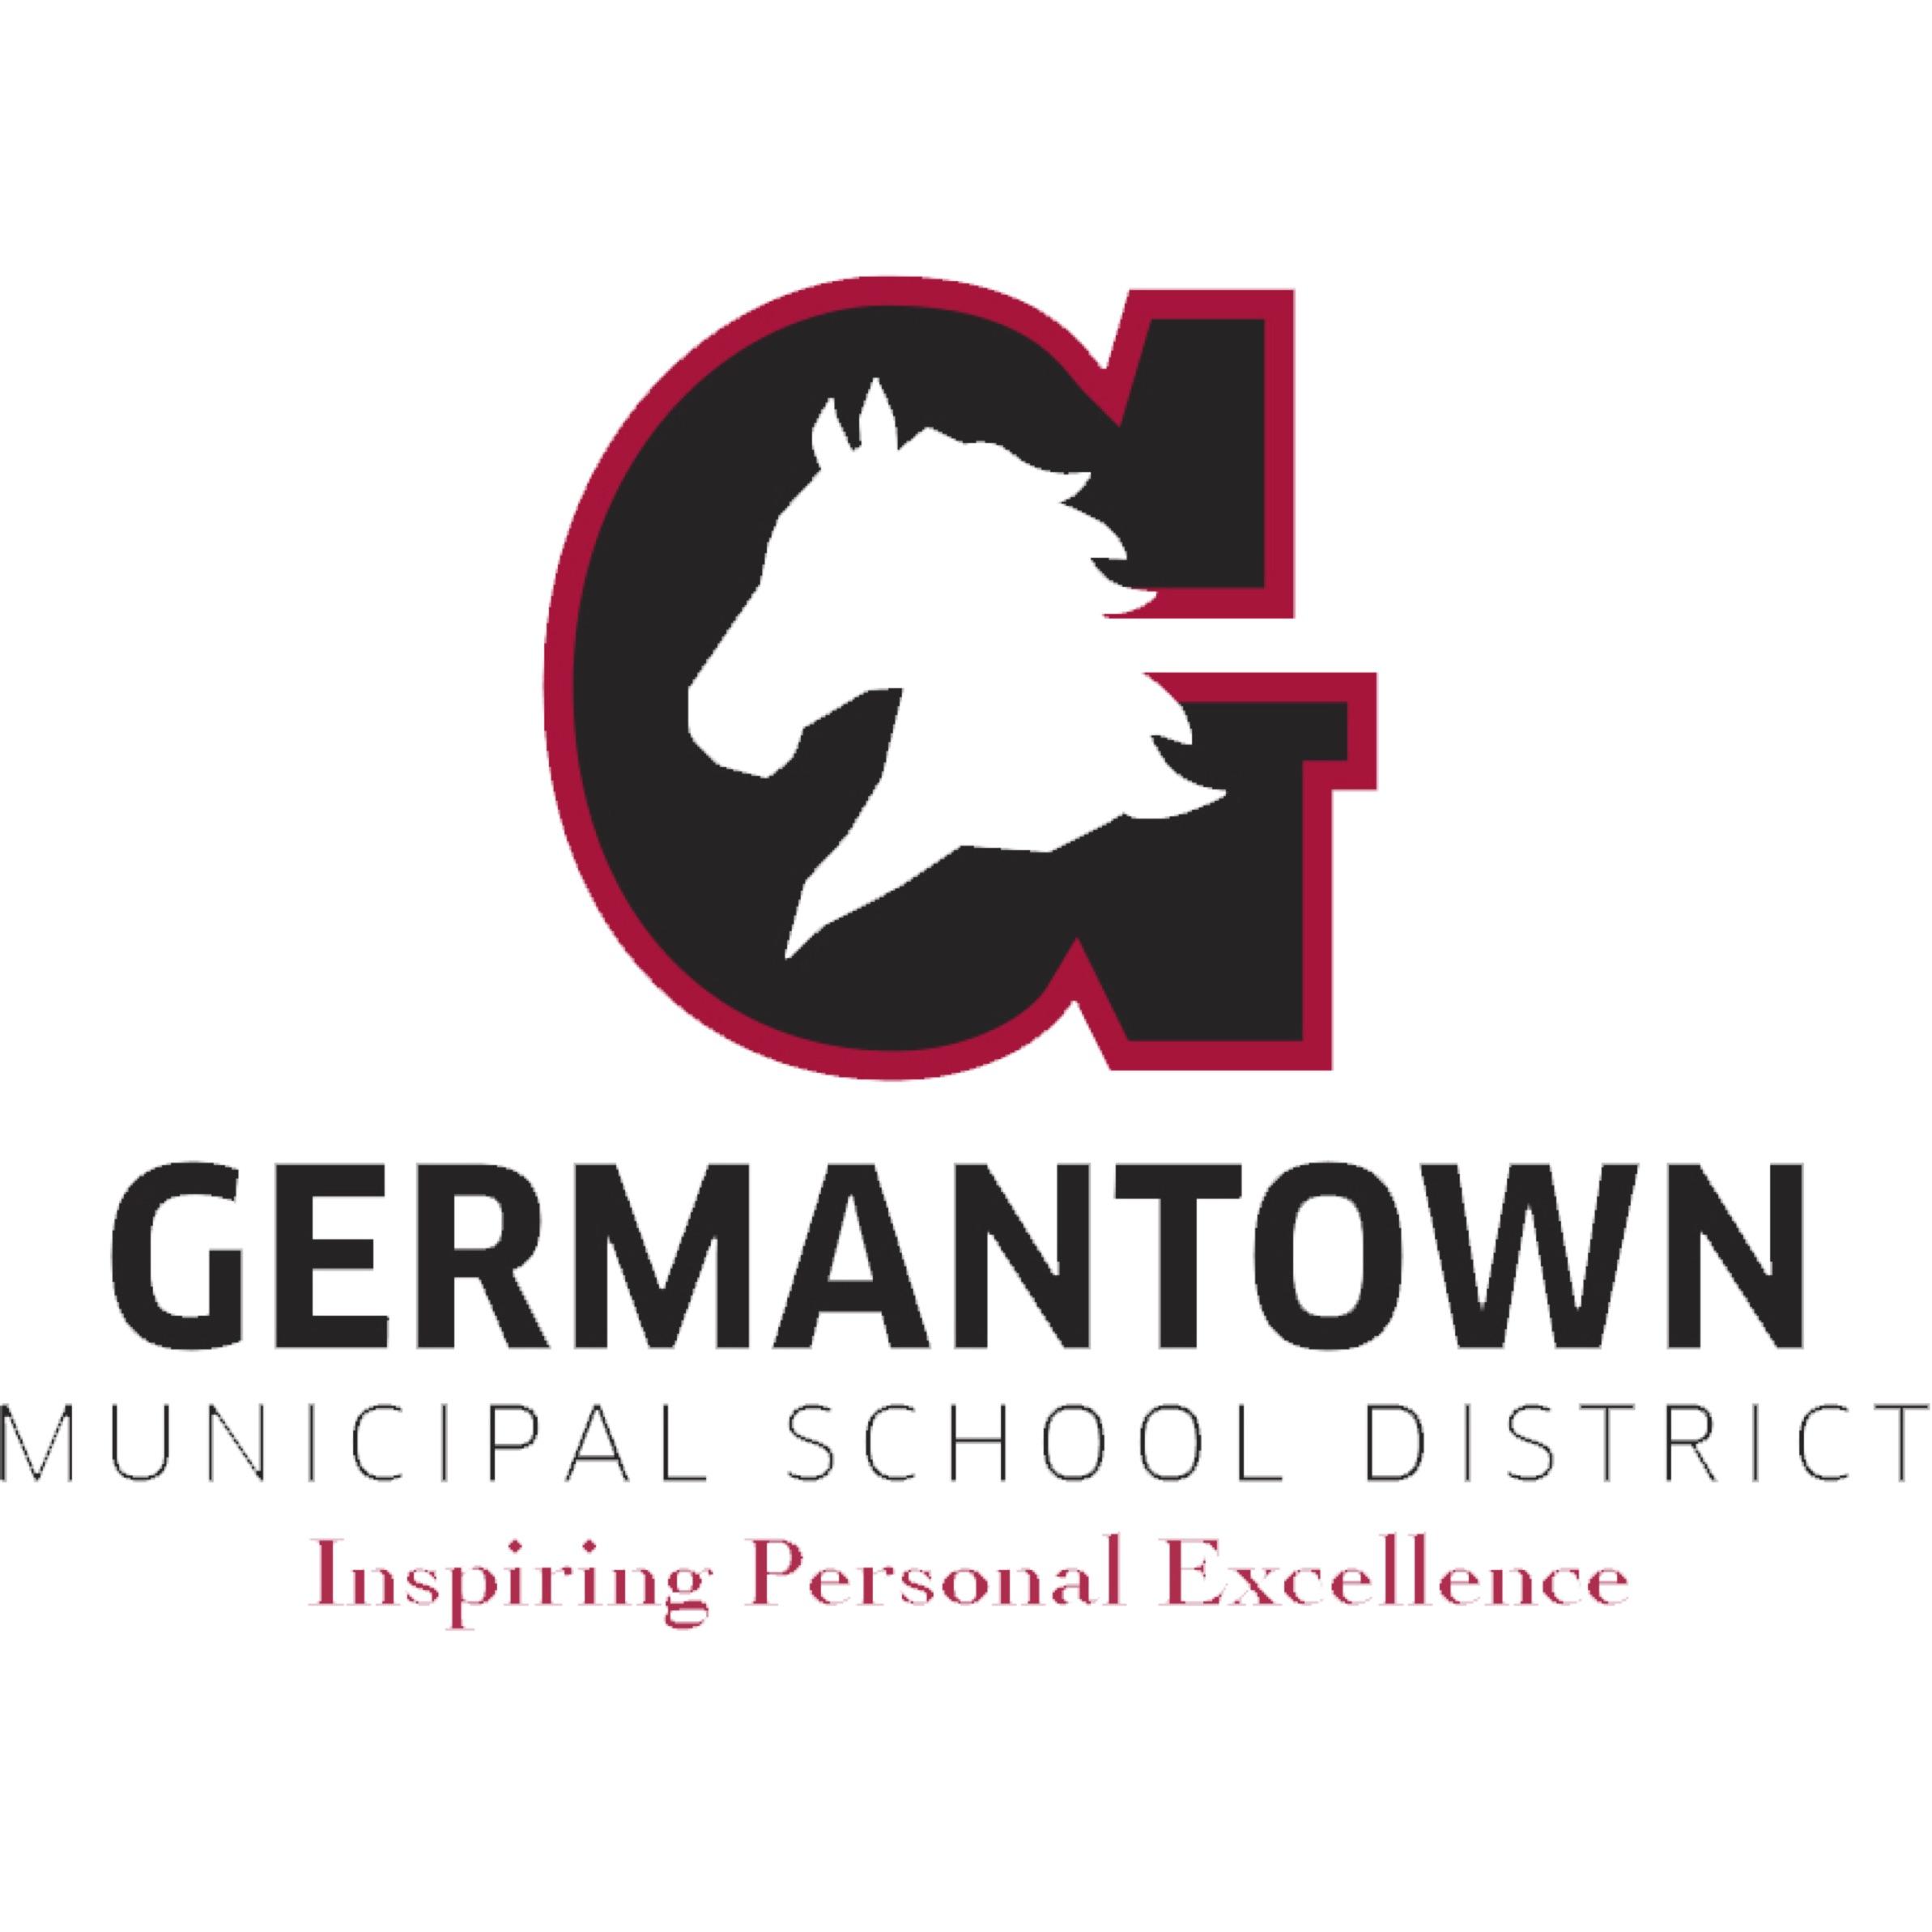 Germantown Municipal School District logo